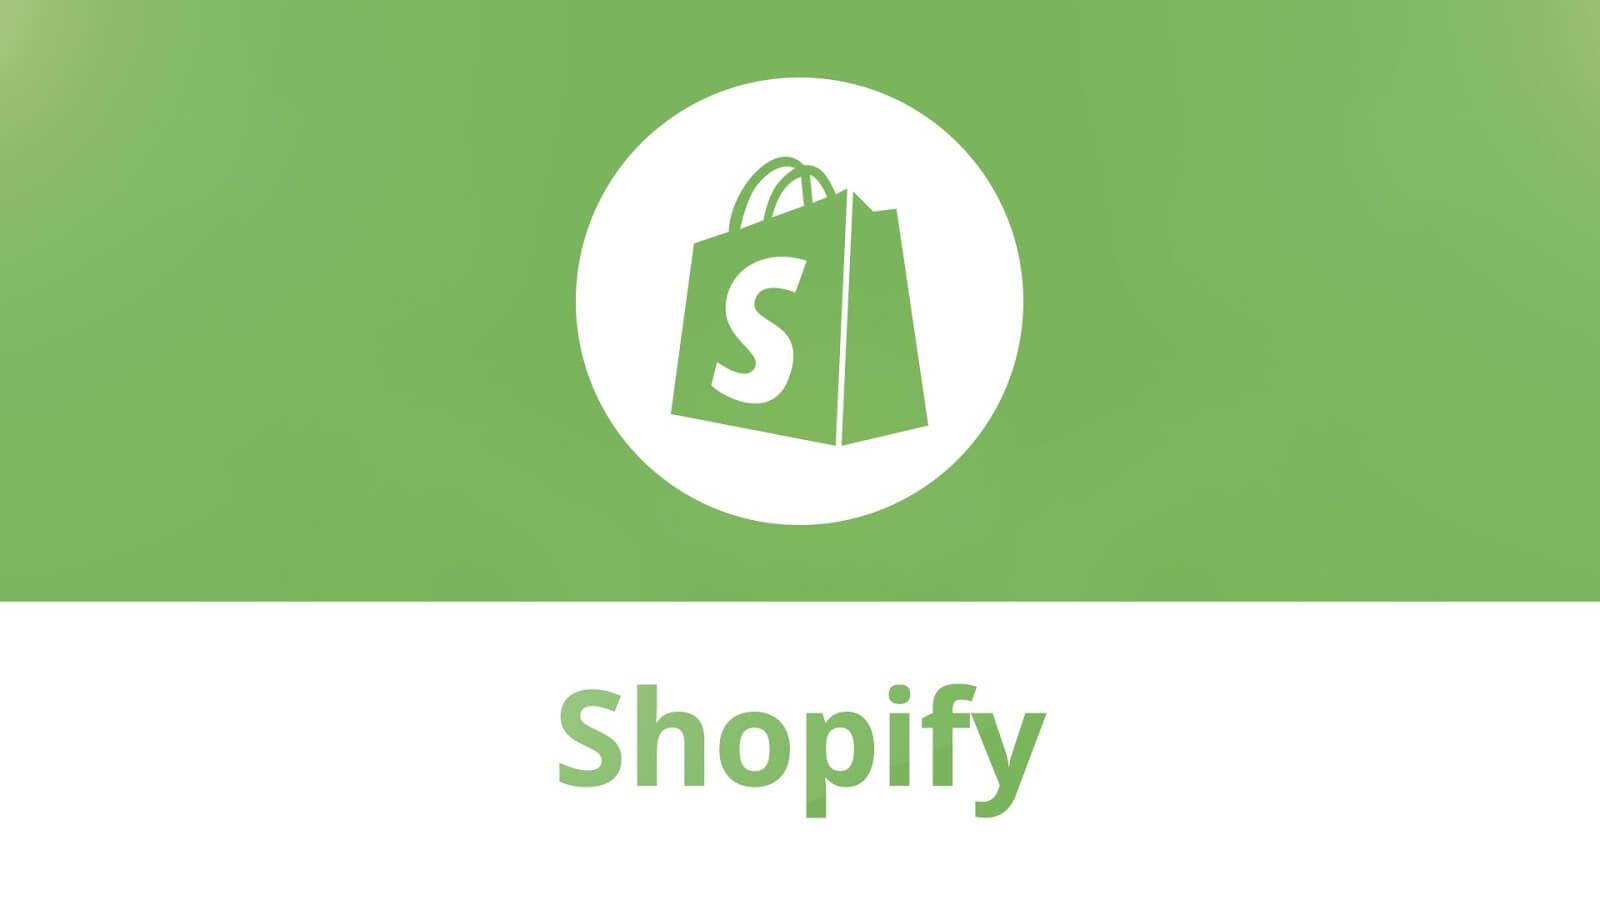 متجر شوبيفاي   شرح طريقة انشاء متجر شوبيفاي Shopify